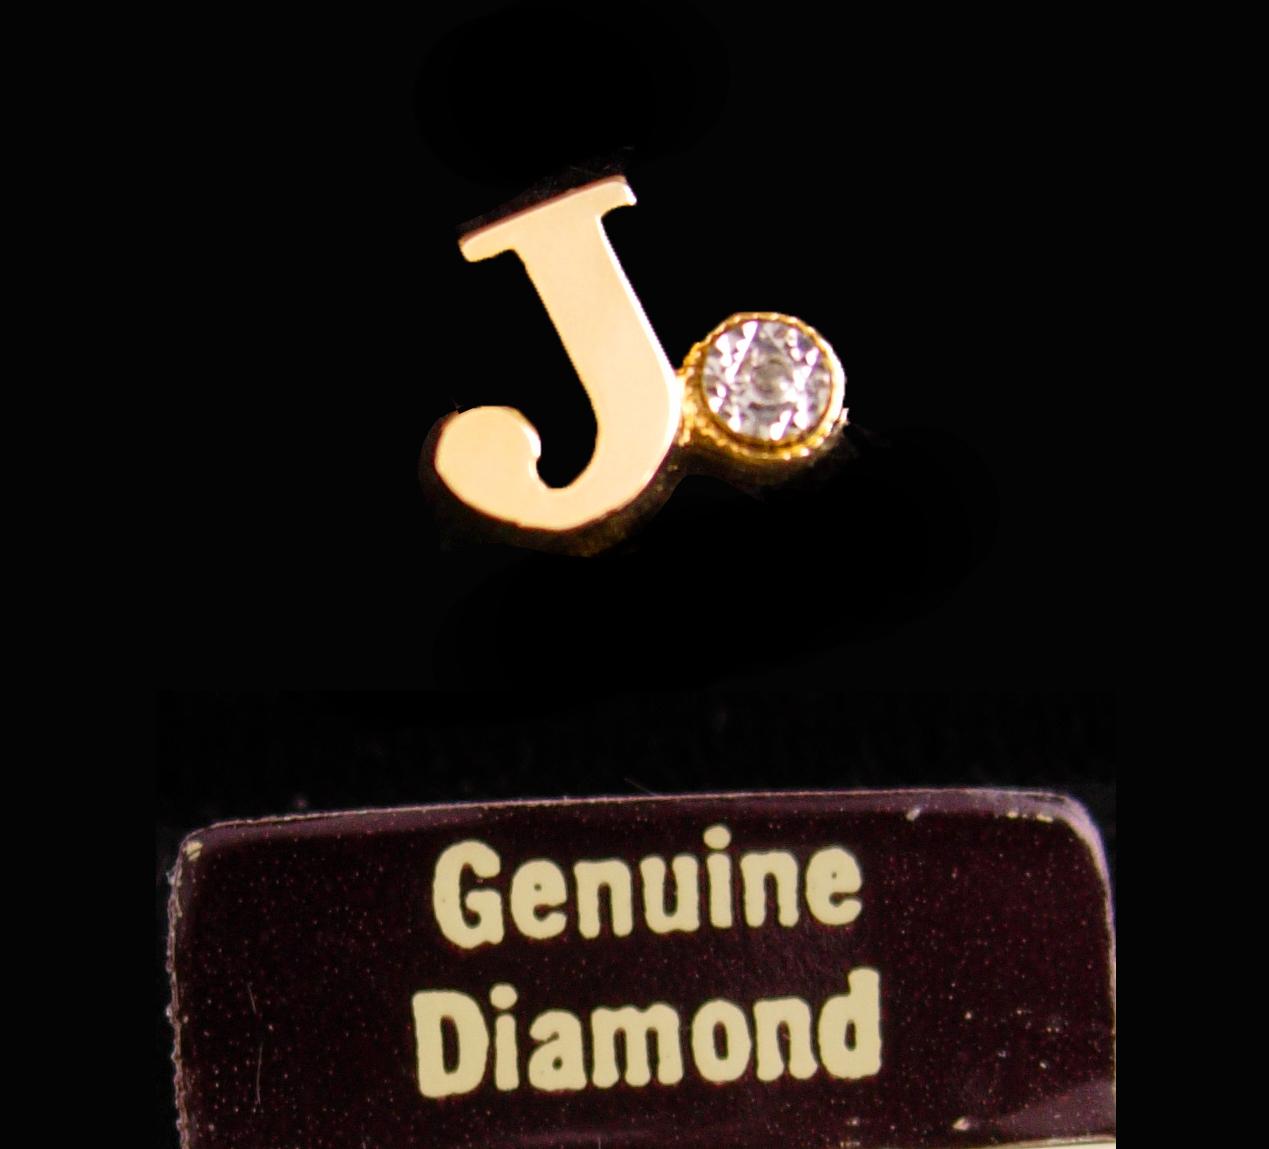 Genuine diamond tie tack - Pierre Cardin - Initial J - personalized letter J - v - $125.00